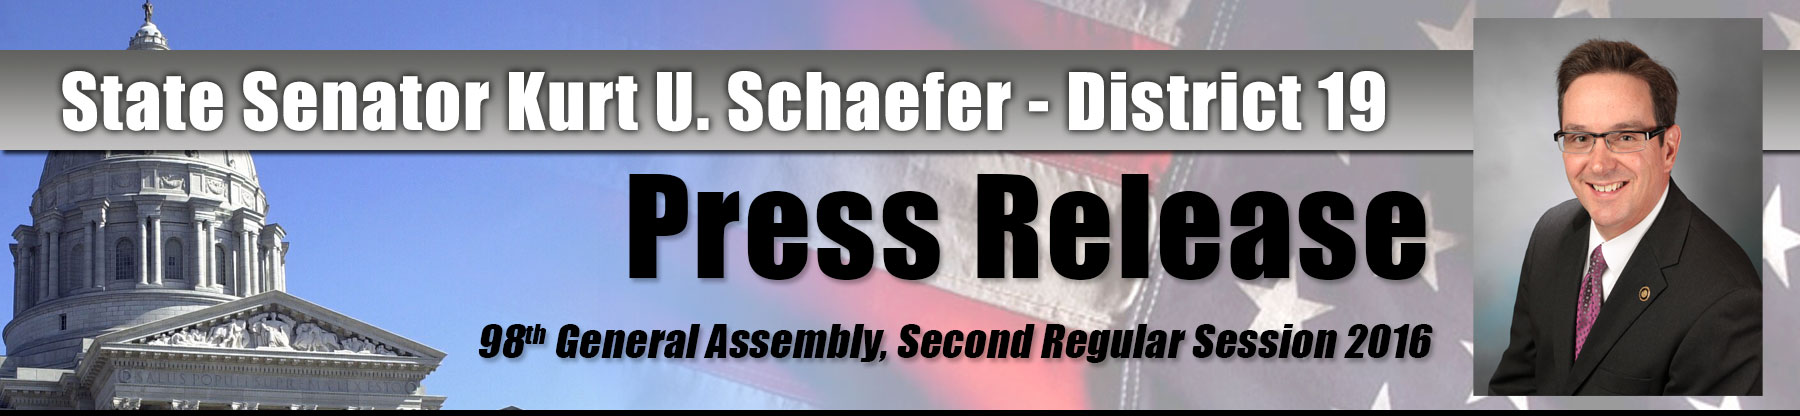 Schaefer--Press-Release-Banner-2016